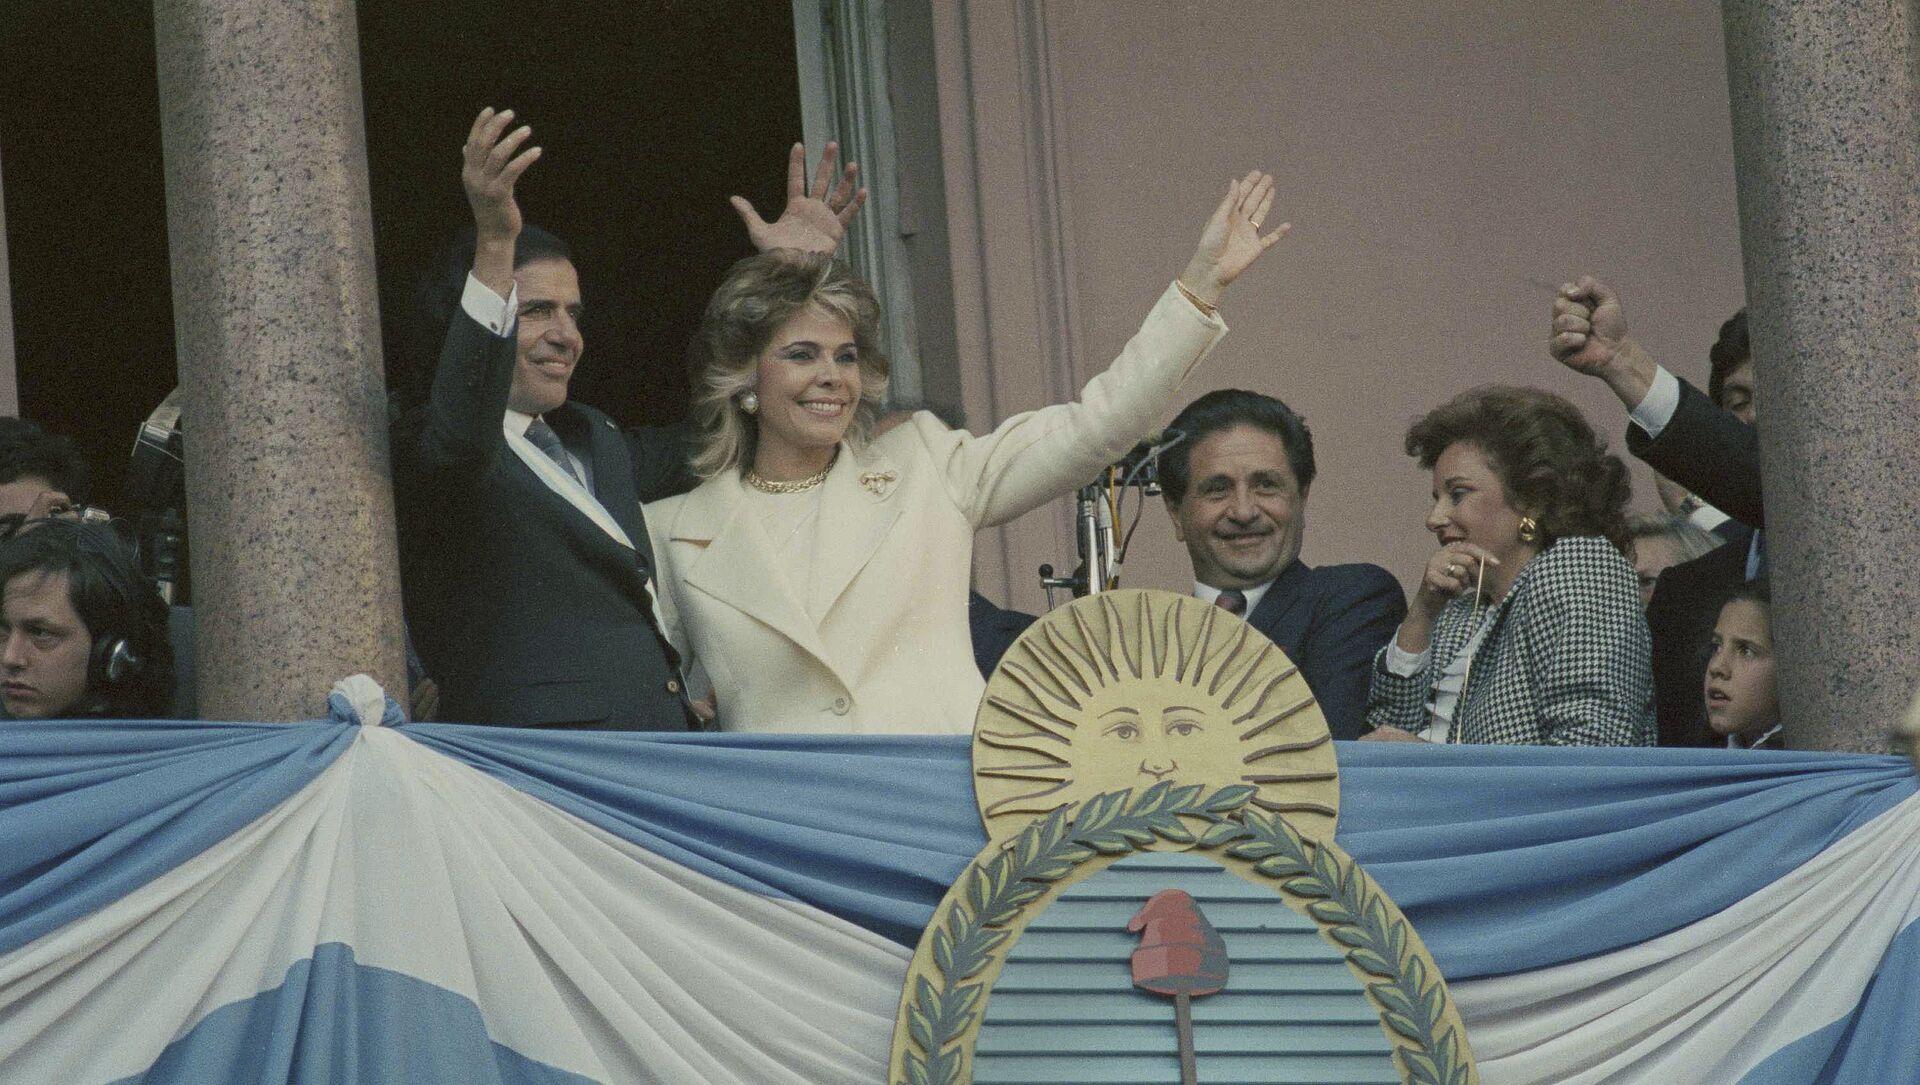 Carlos Menem, expresidente de Argentina y su exesposa, Zulema Yoma (archivo) - Sputnik Mundo, 1920, 09.07.2019